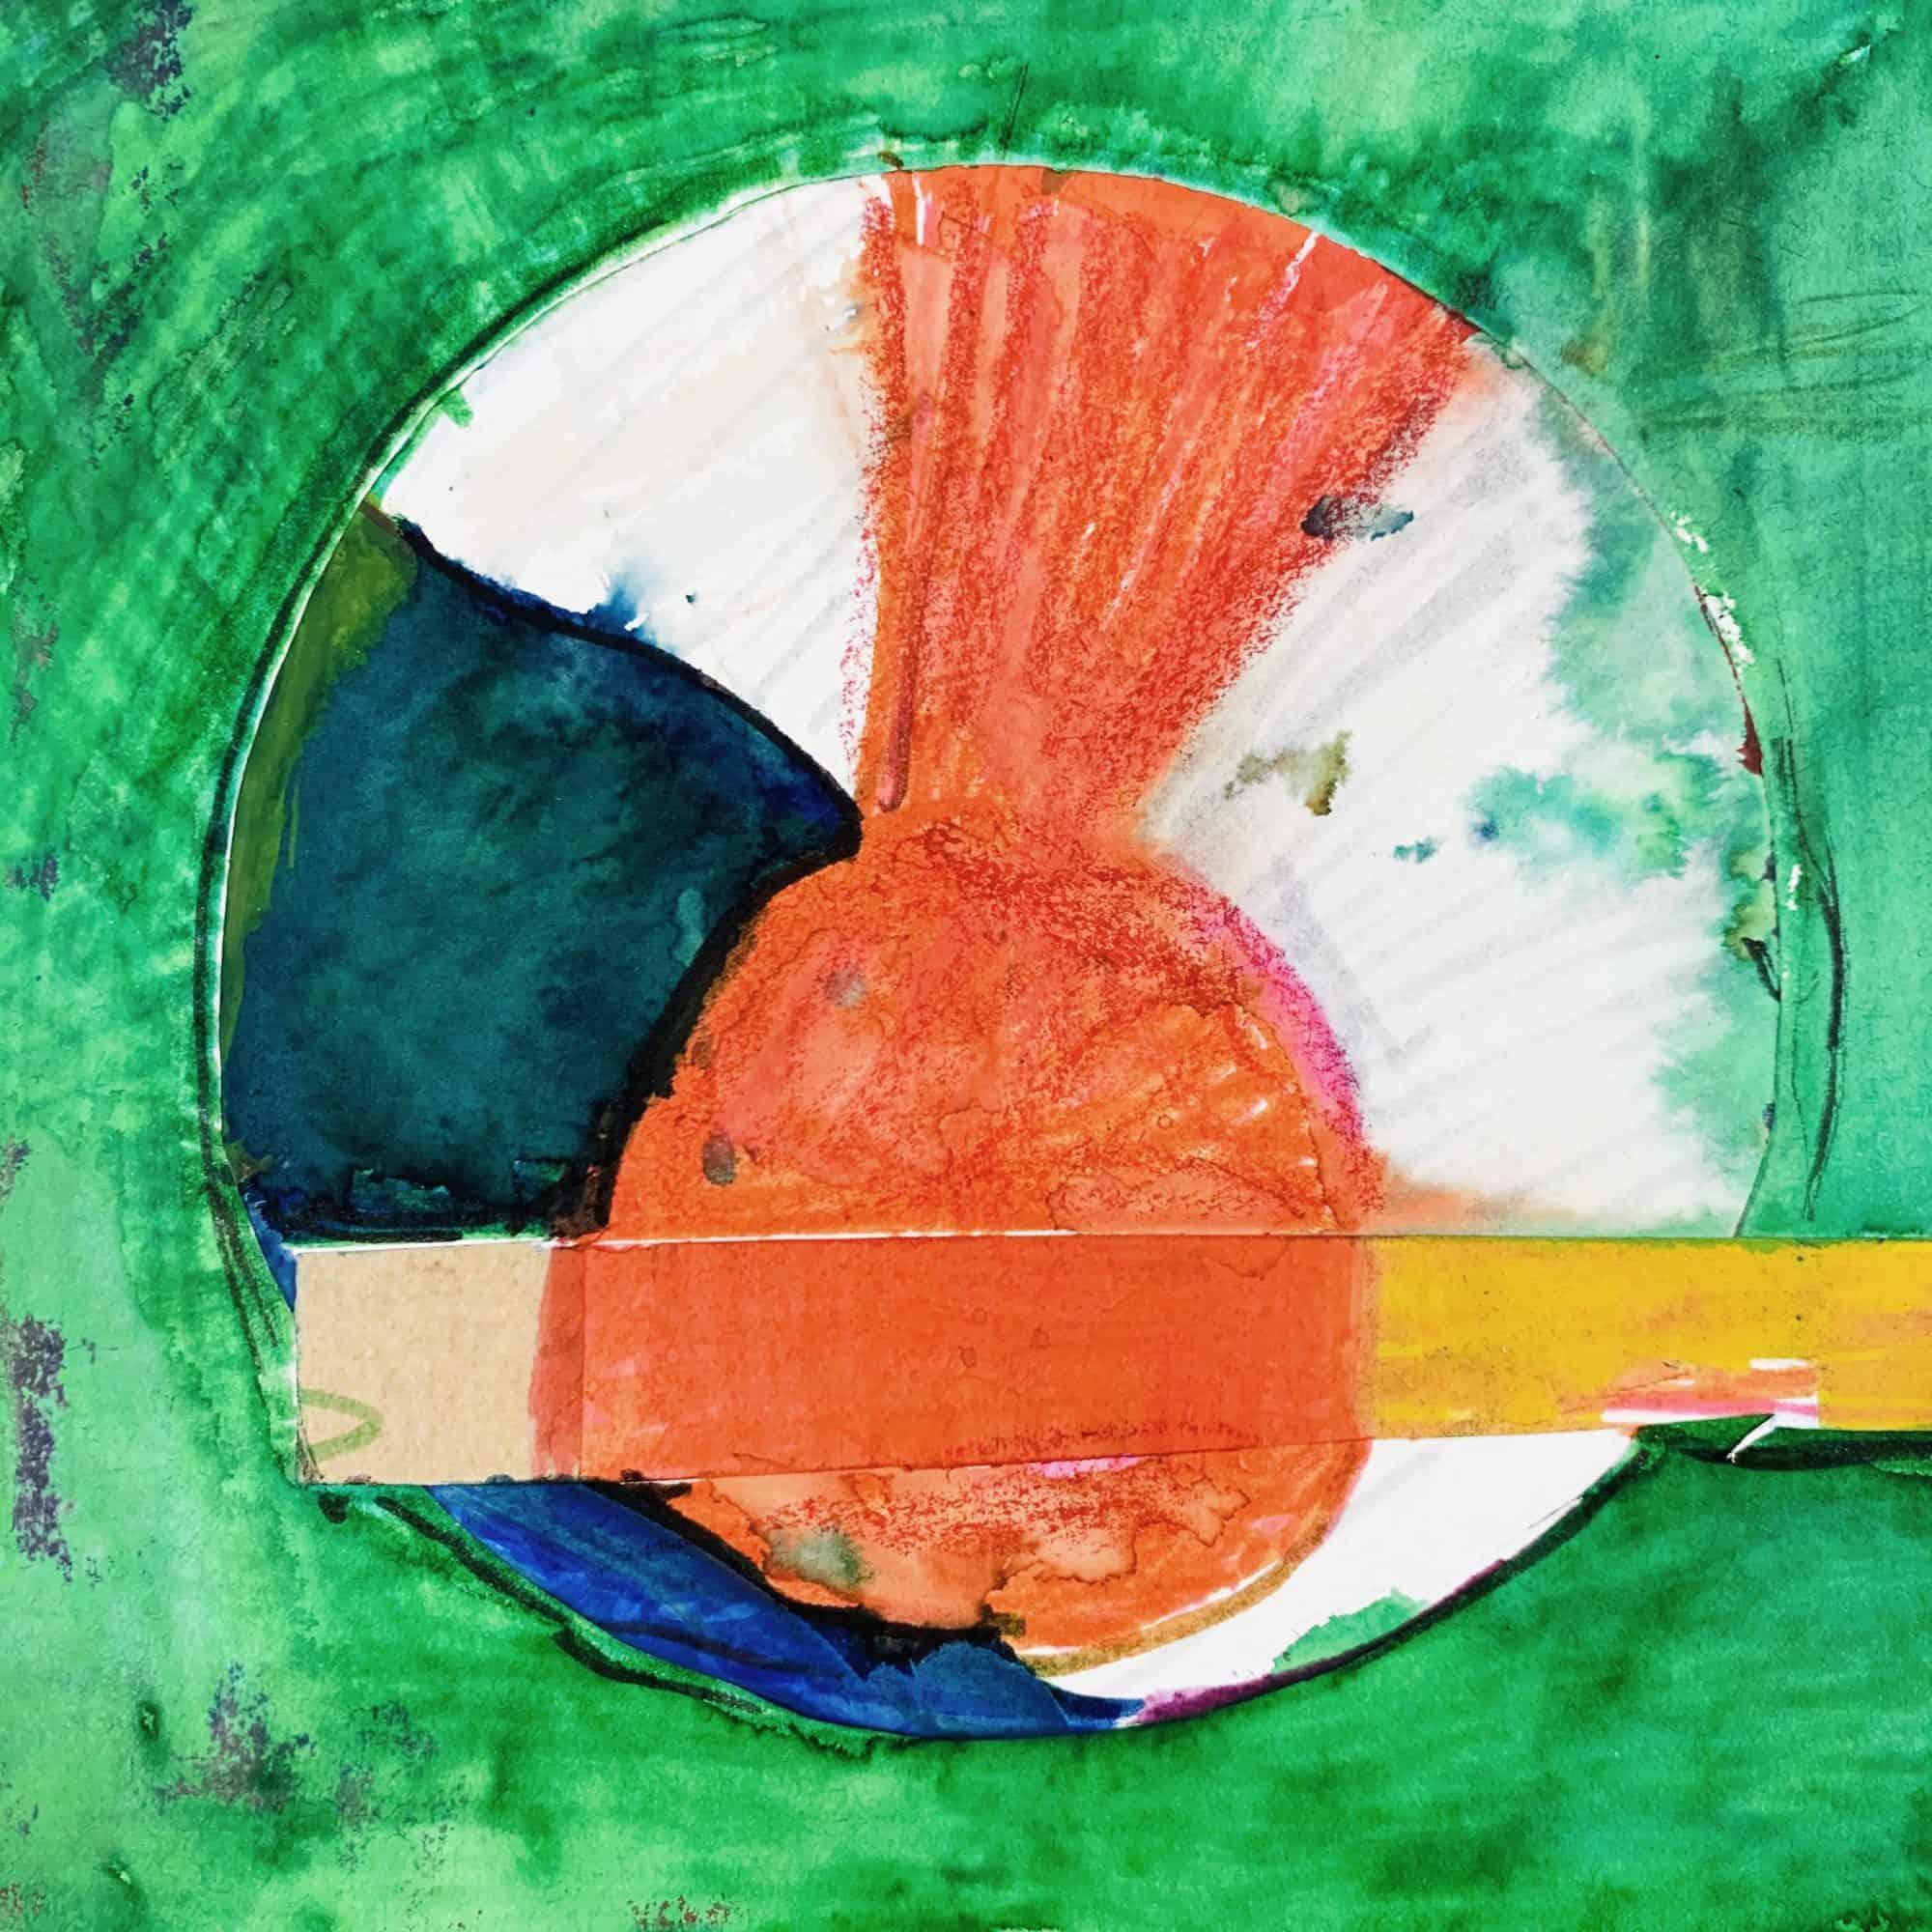 Abstraktes Acrylbild roter Kreis und Grün